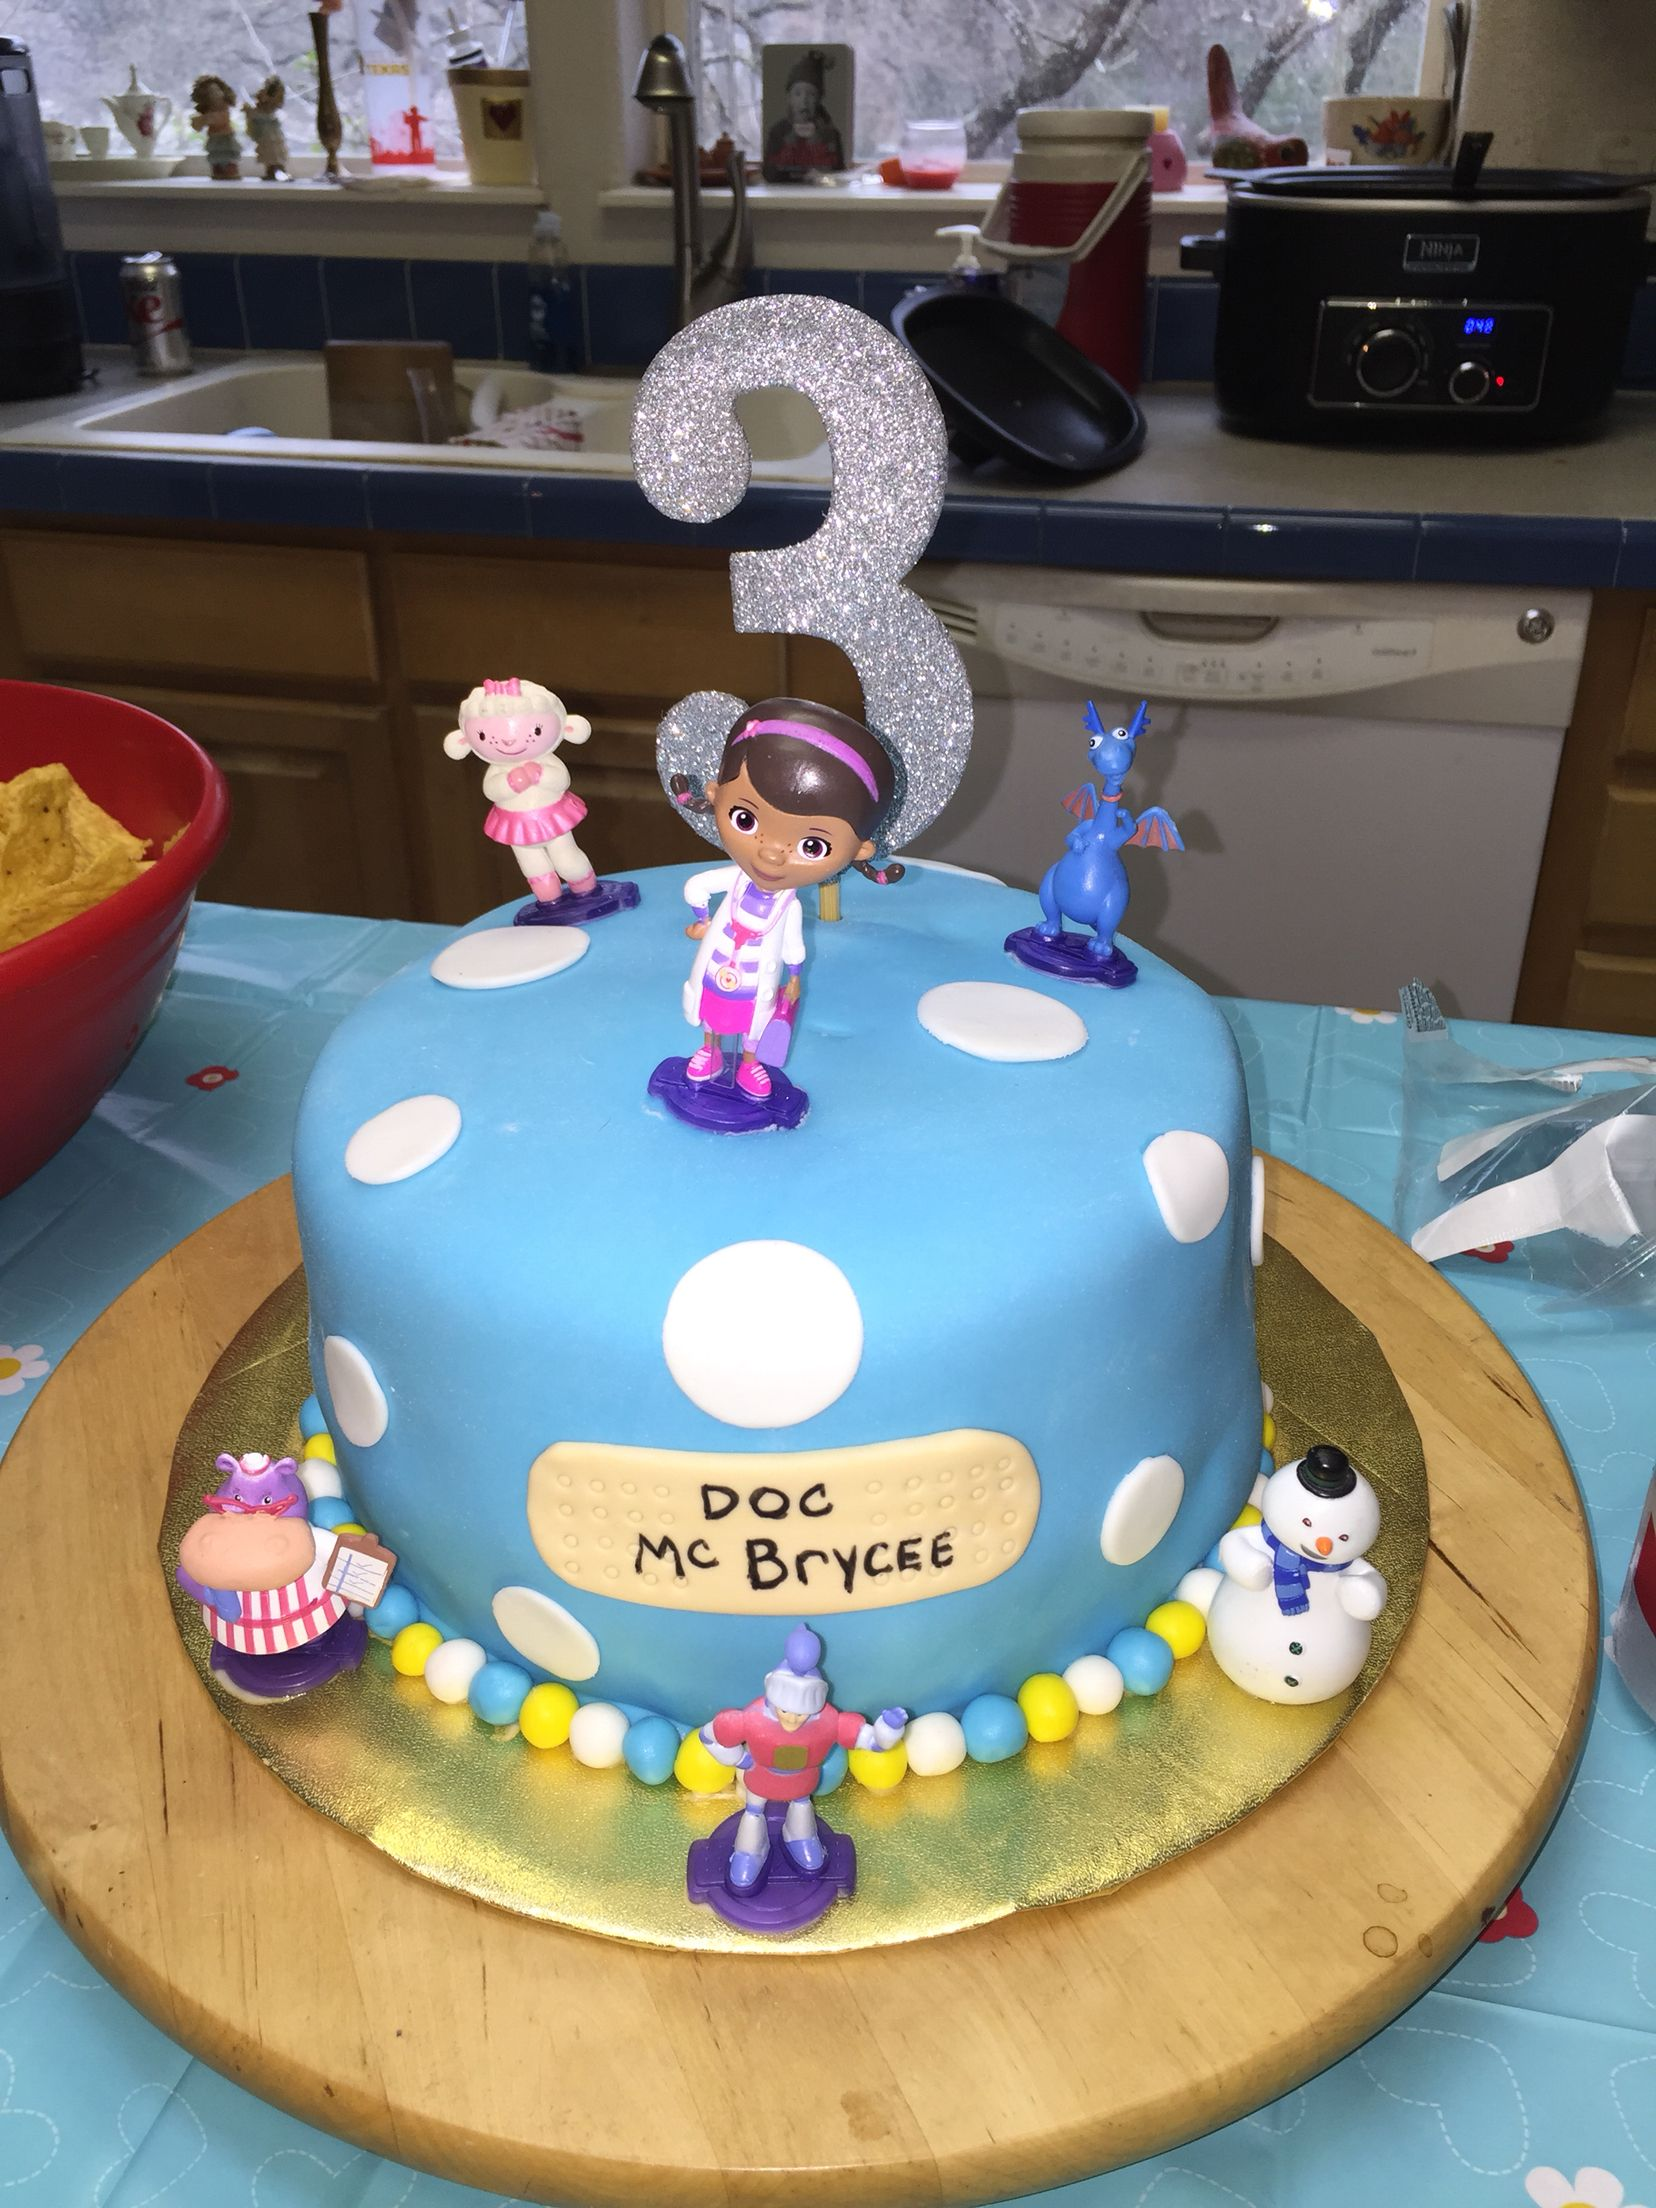 Doc mcstuffins bandages doc mcstuffins party ideas on pinterest doc - Doc Mcstuffins Cake For Boy Happy Birthday To My Lil Doc Mcbrycee